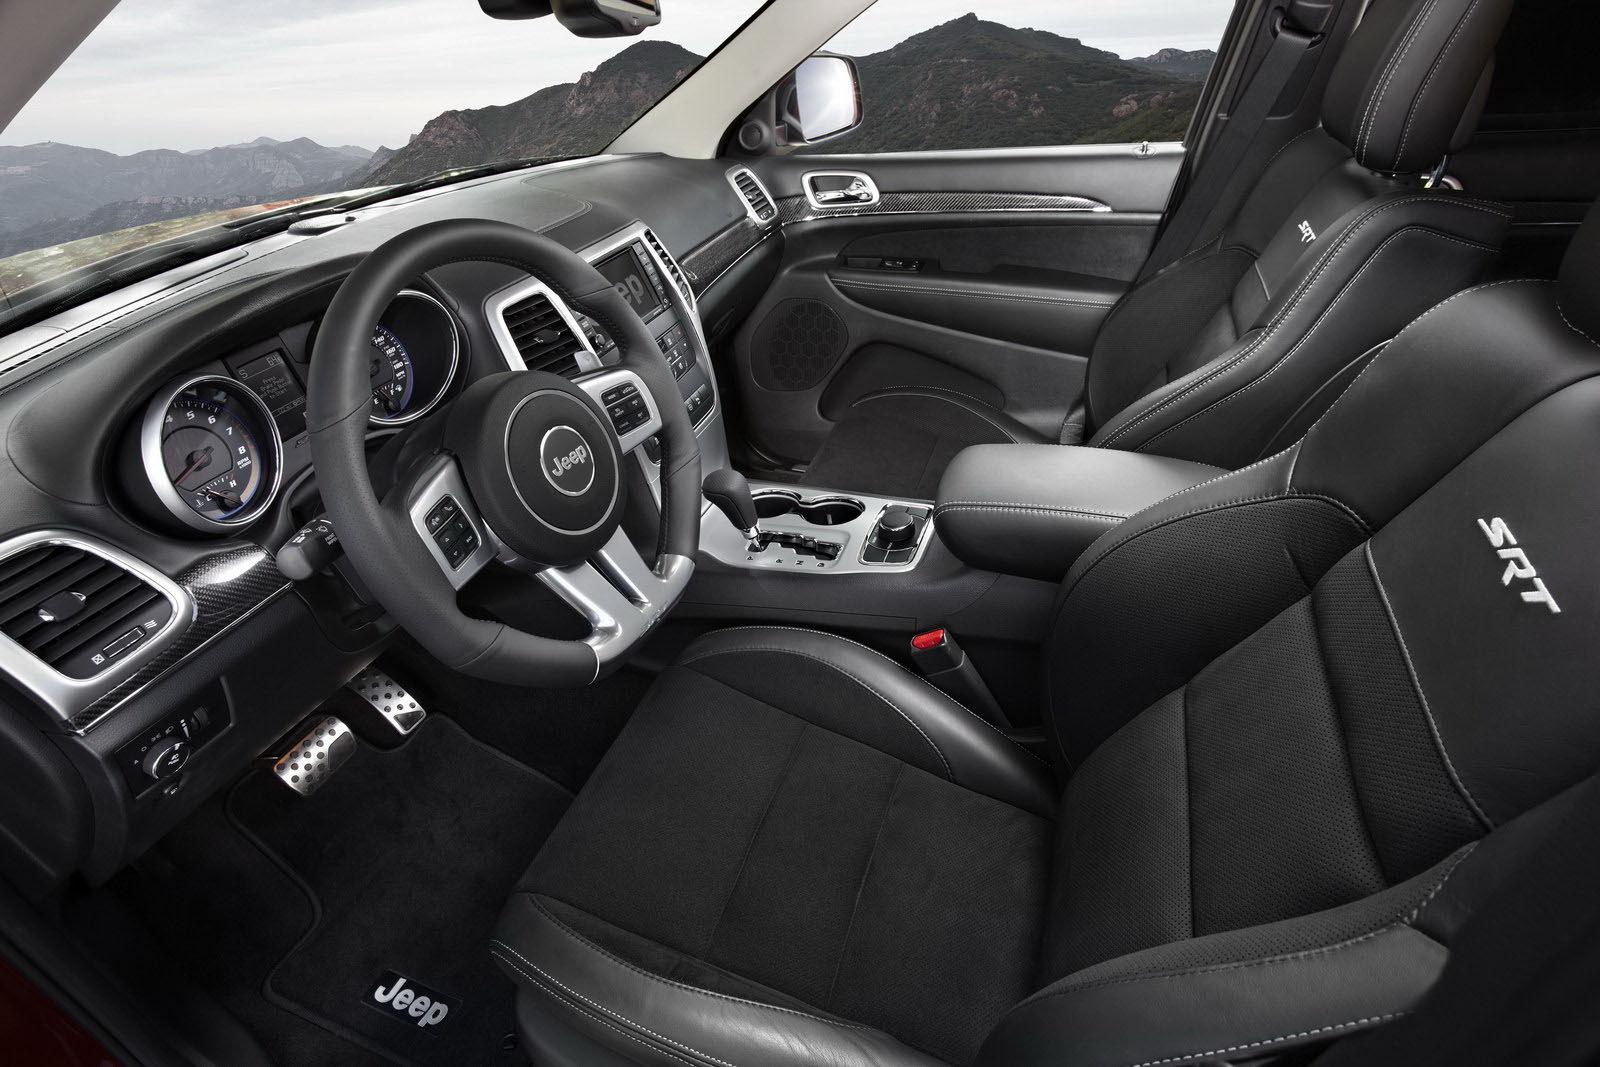 Jeep 2008 jeep grand cherokee interior : Jeep Grand Cherokee Srt 2016 Interior - Best Accessories Home 2017